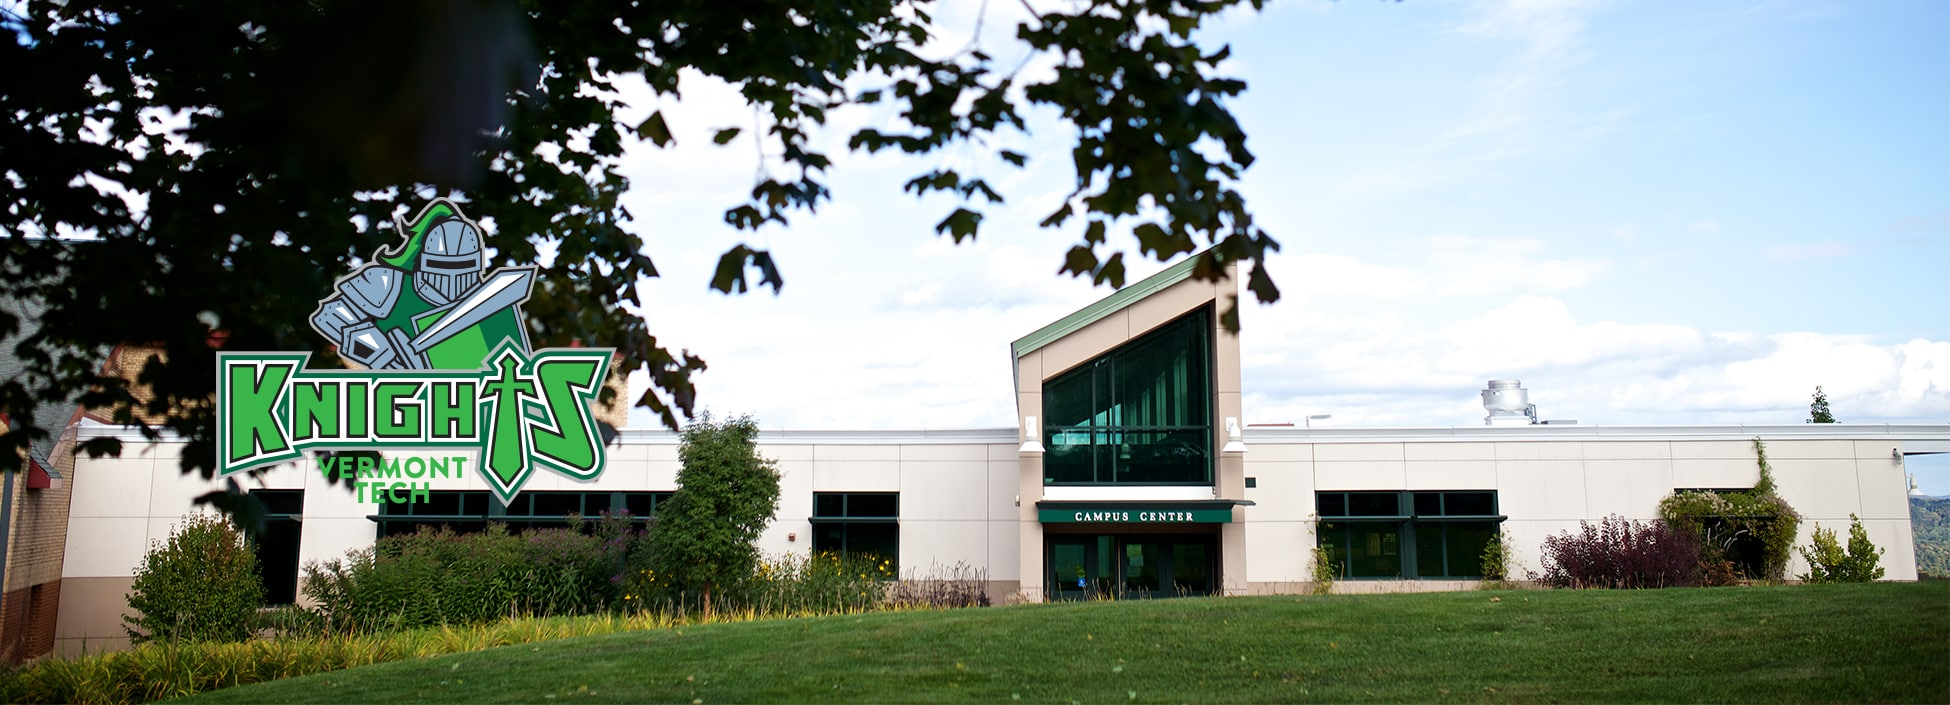 SHAPE Center, Vermont Tech athletics, green knight